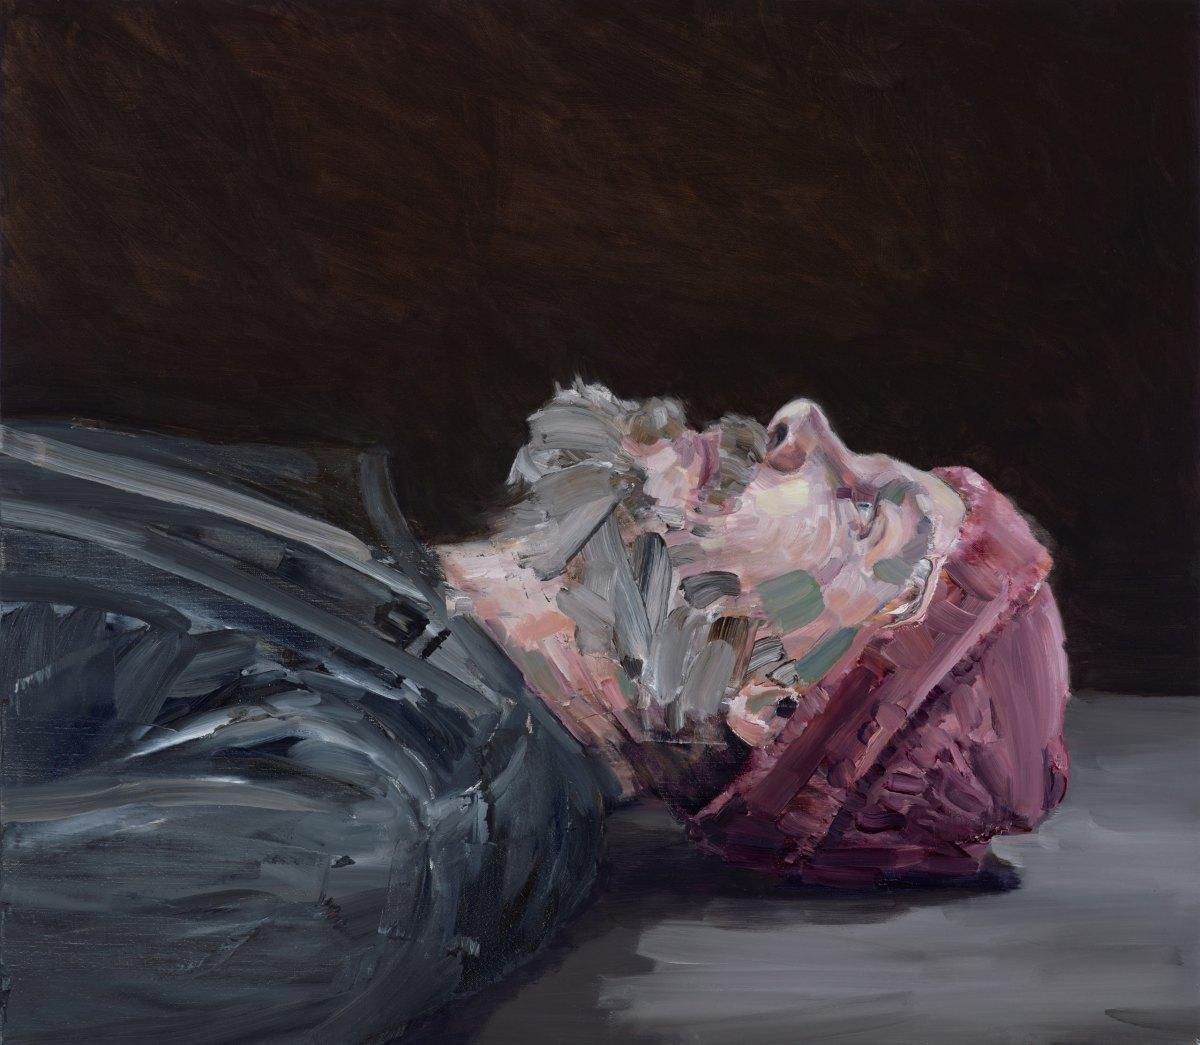 Guy Maestri - Shattered (Griggs)